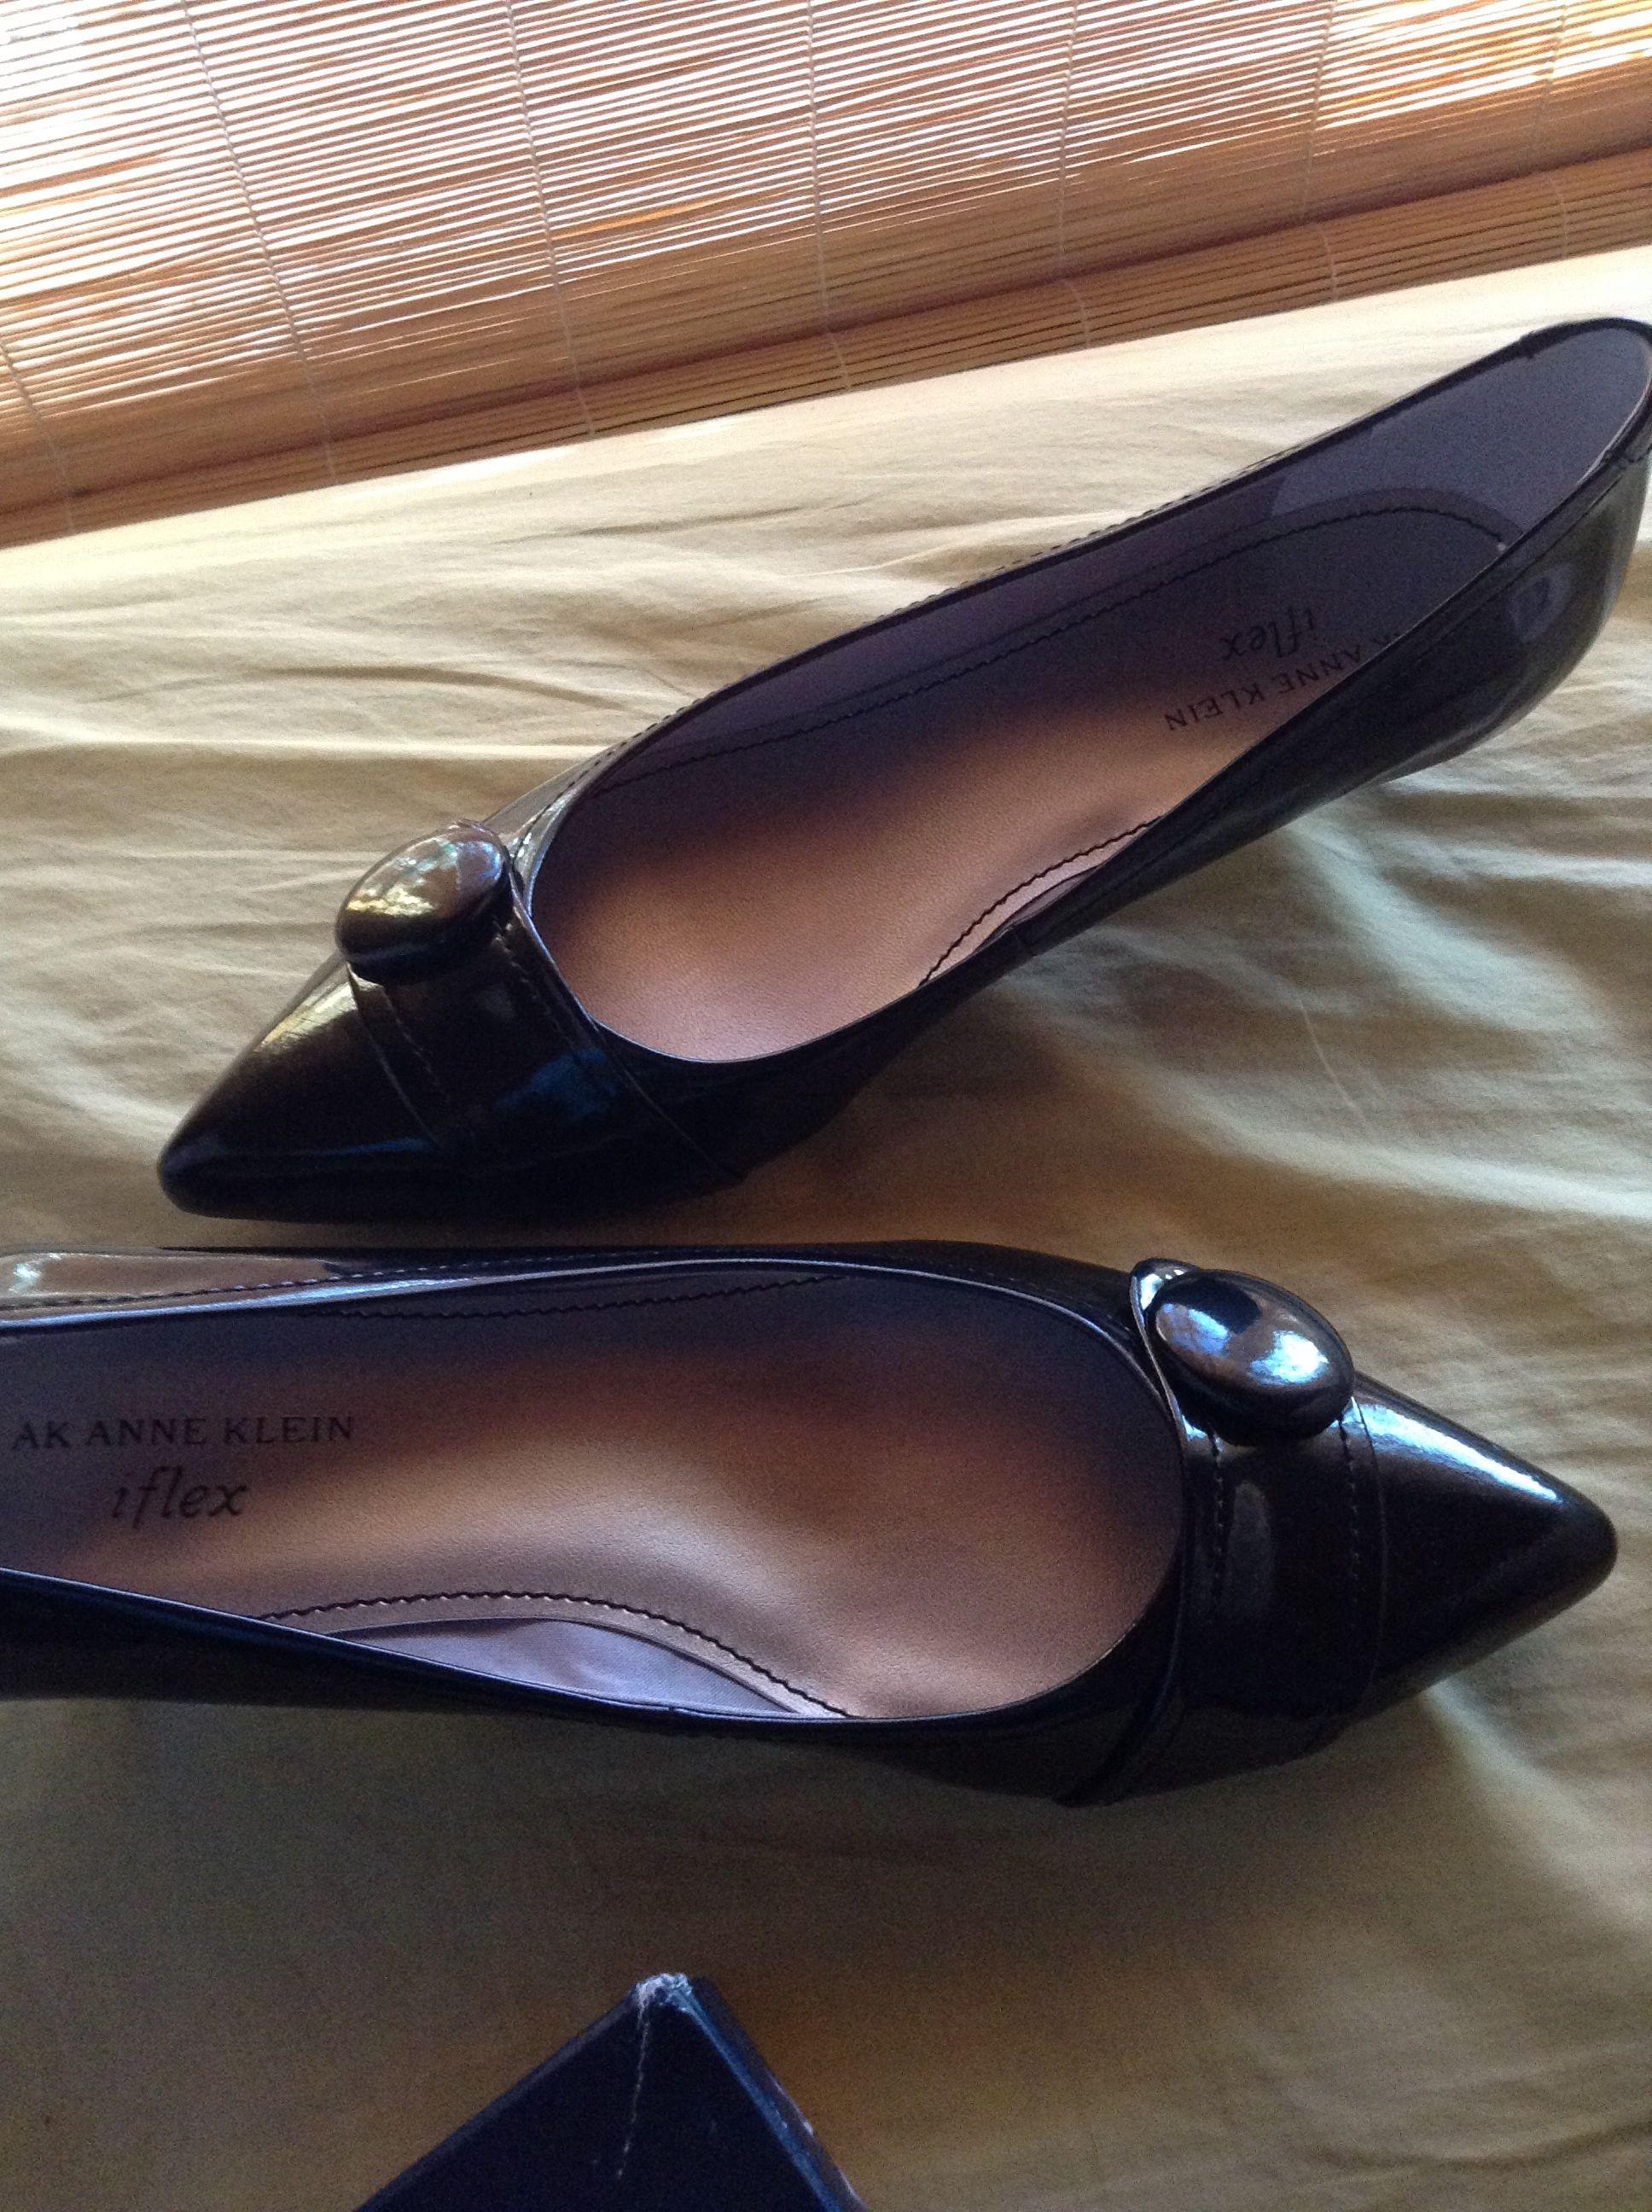 Anne Klein From Dsw Black Kitten Heels Black Kitten Heels Dress And Heels Dress Shoes Men